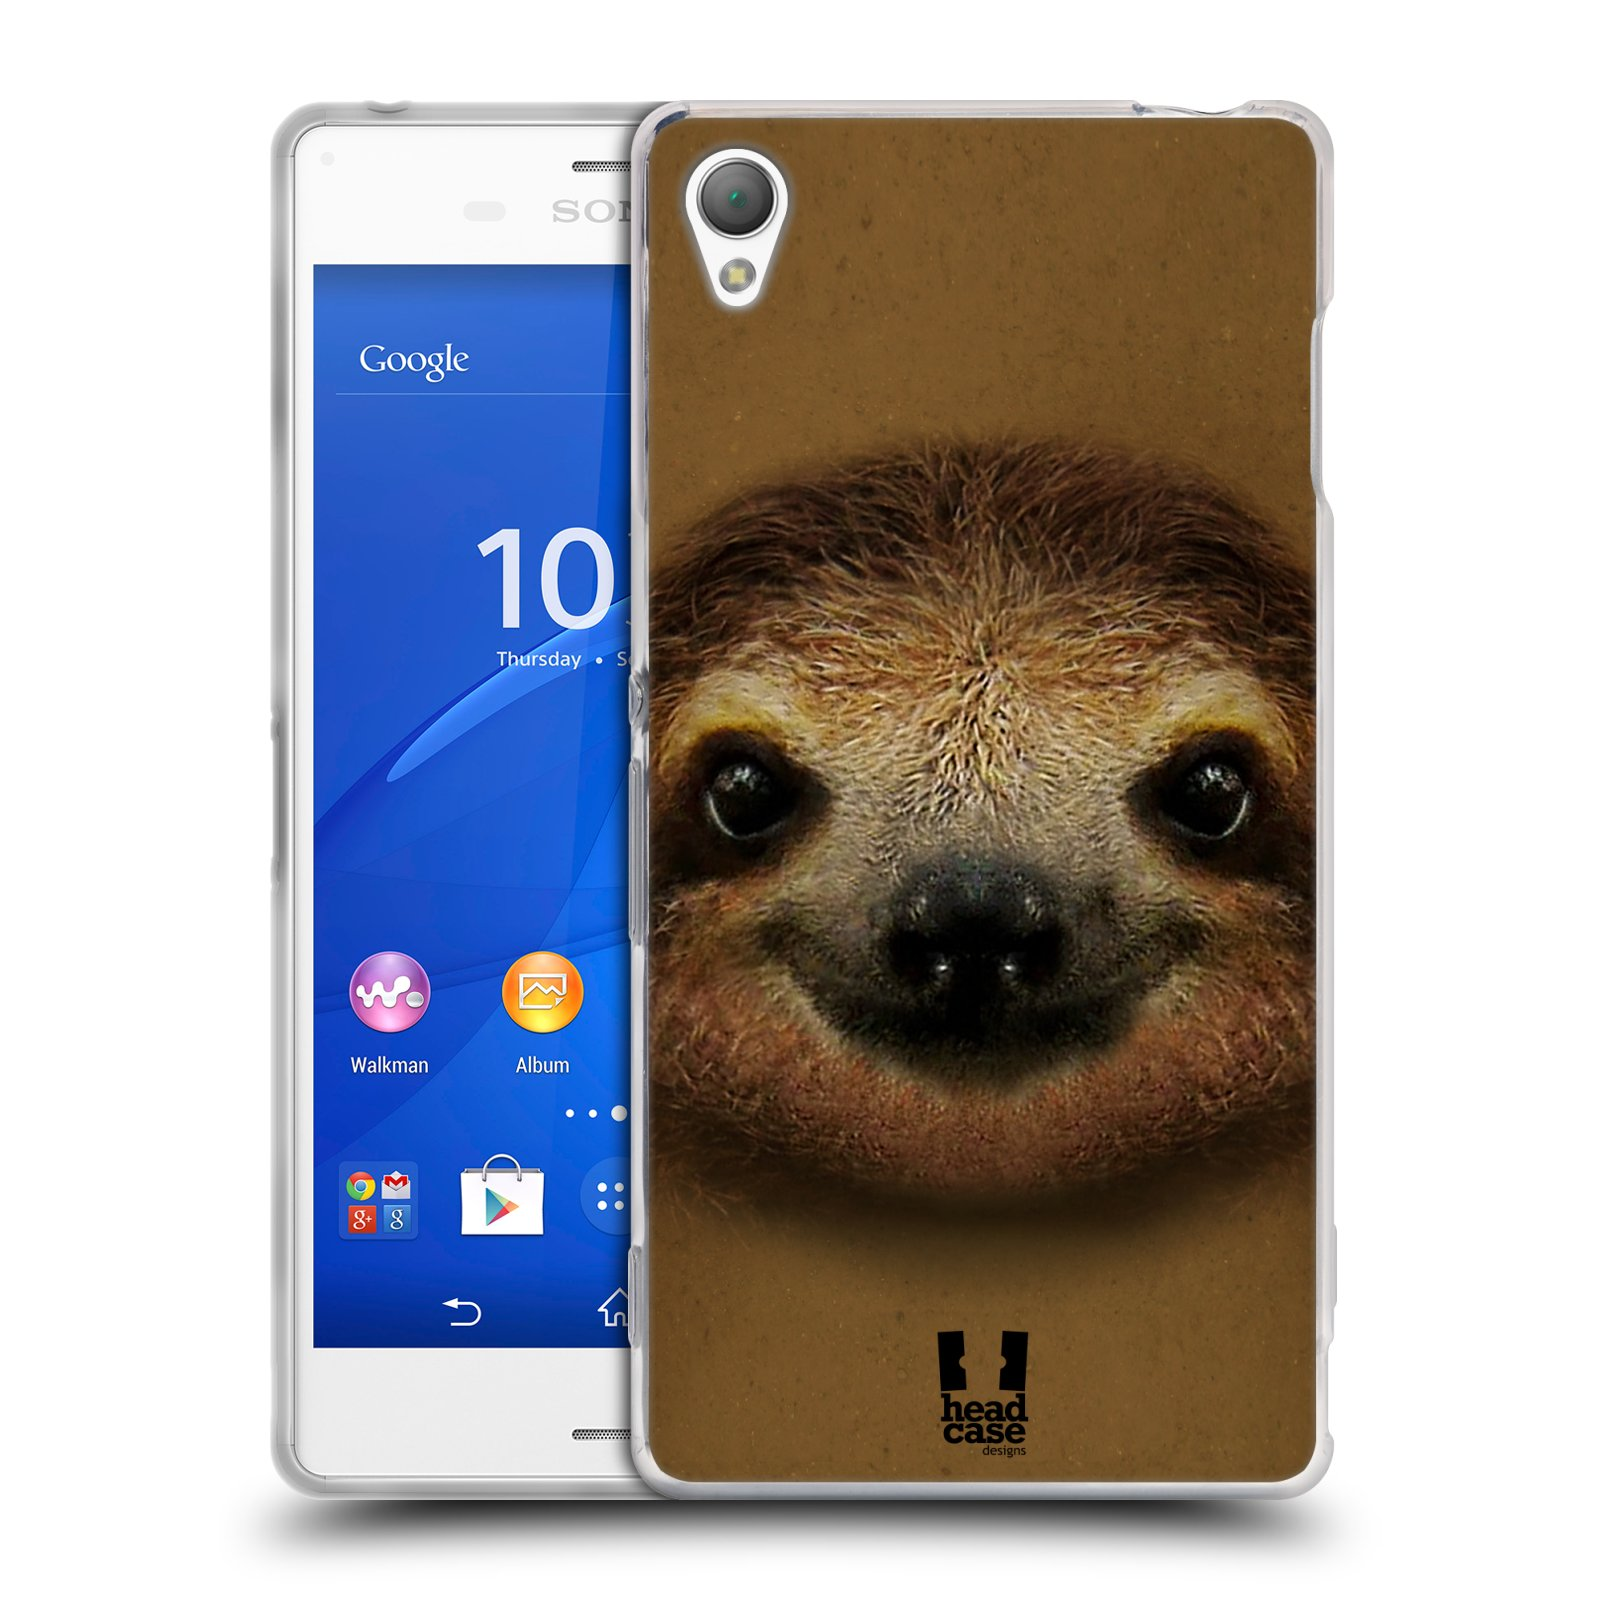 HEAD CASE silikonový obal na mobil Sony Xperia Z3 vzor Zvířecí tváře 2 lenochod